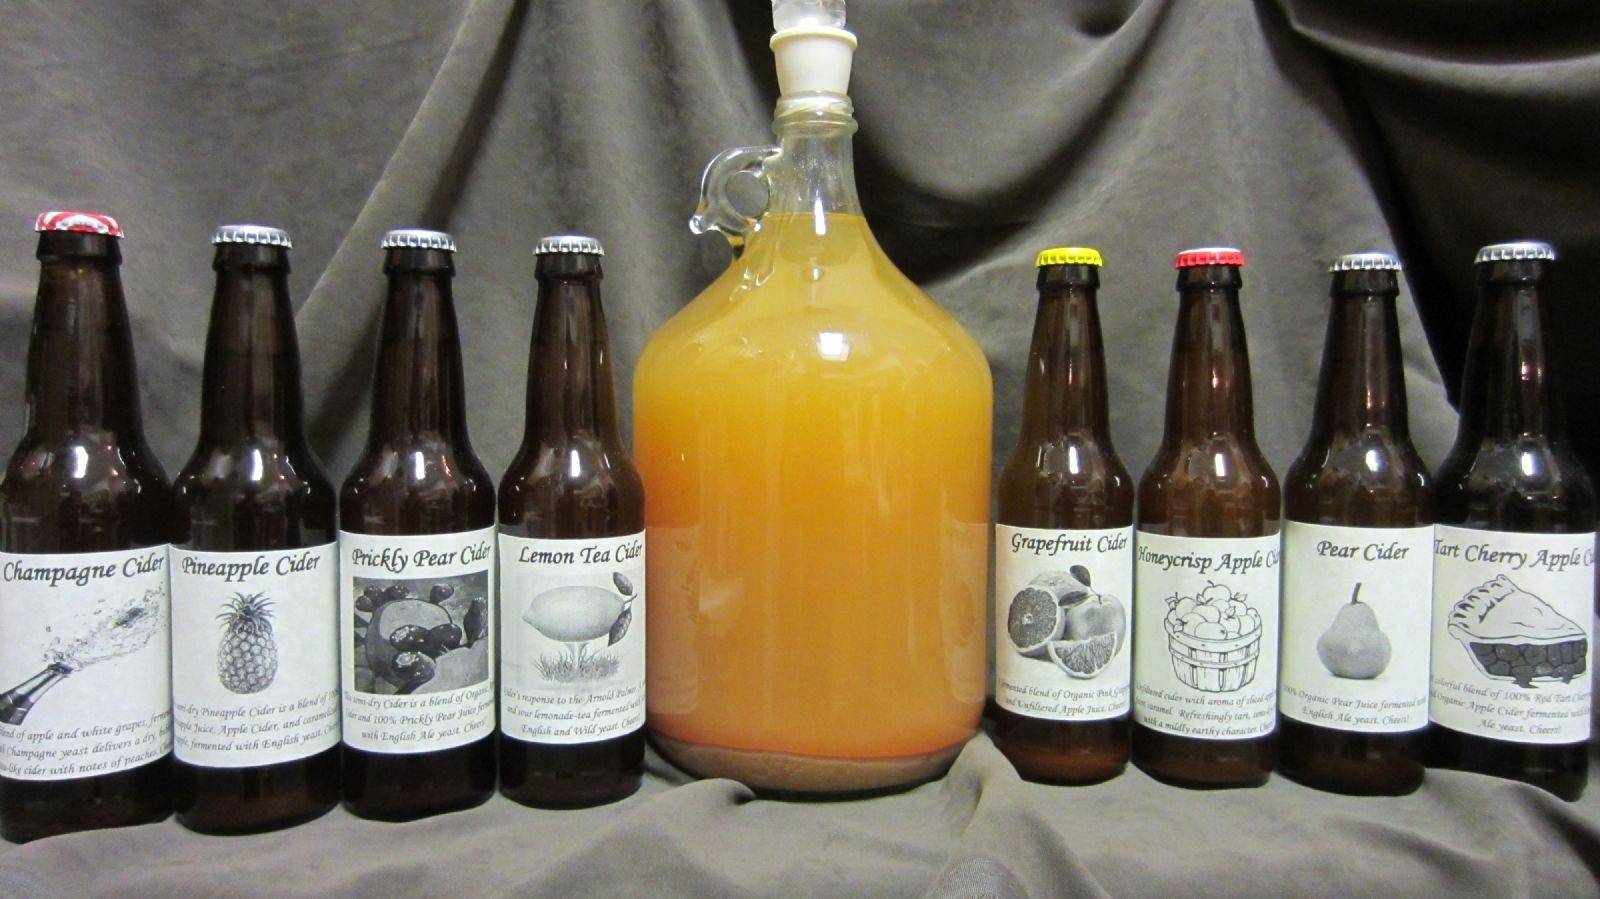 Beer Label Template Word Lovely Beer Bottle Label Template Word Img 0207 top Label Maker